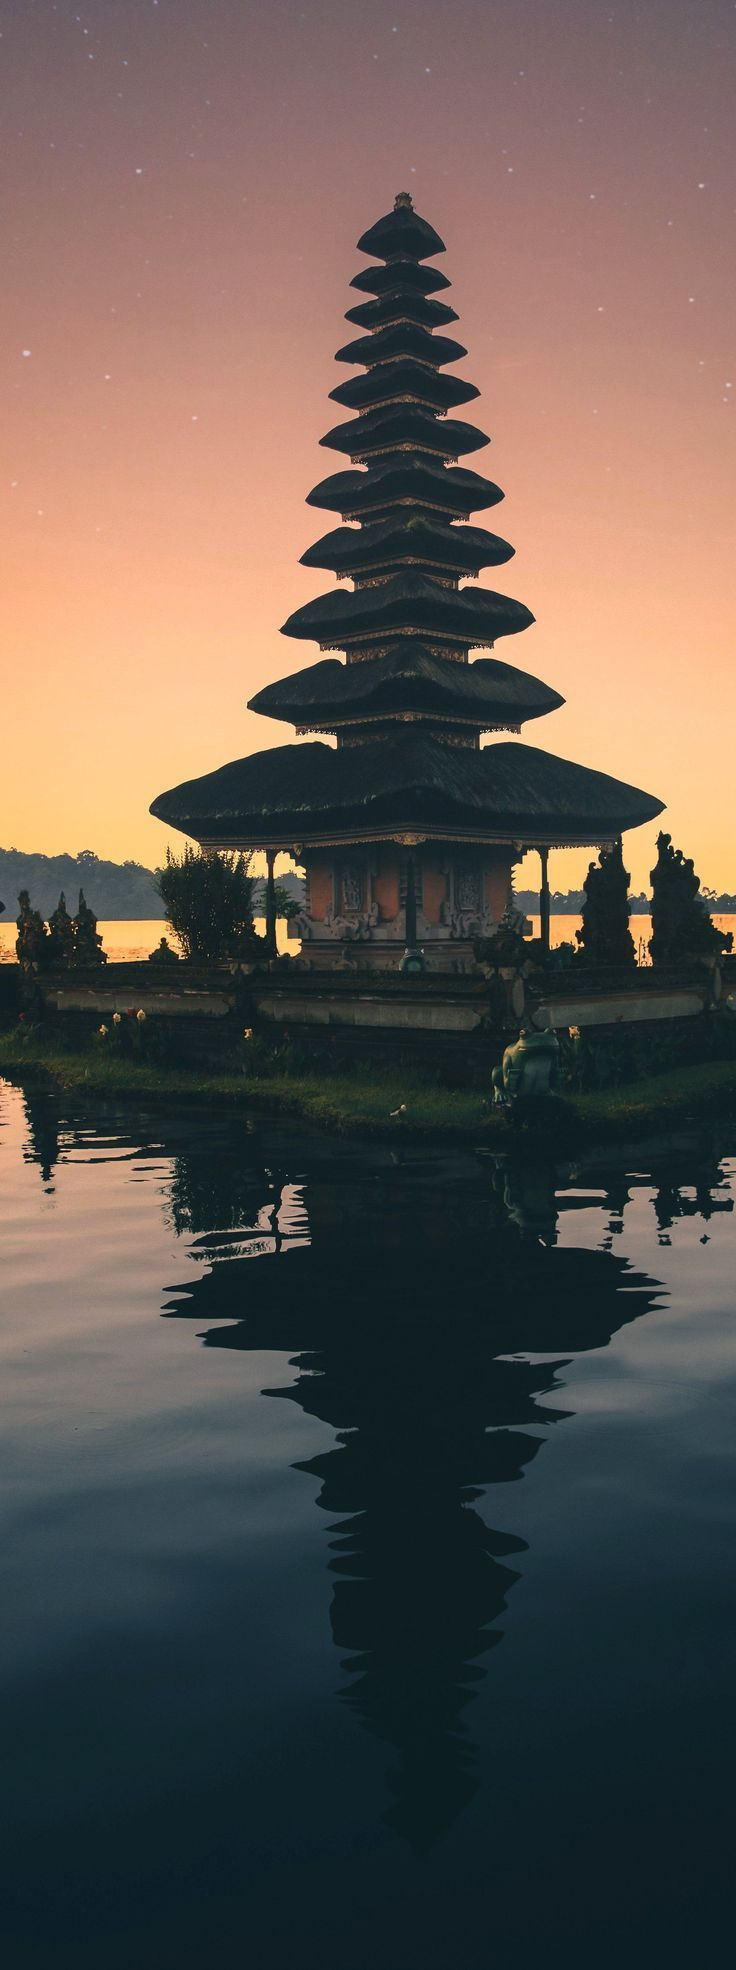 Must Visit Temples in Bali. Indonesia Travel Destinations | Indonesia Honeymoon | Backpack Indonesia | Backpacking Indonesia | Indonesia Vacation | Indonesia Photography #travel #honeymoon #vacation #backpacking #budgettravel #bucketlist #wanderlust #Asia #southeastasia #indonesia #visitIndonesia #TravelIndonesia #IndonesiaTravel